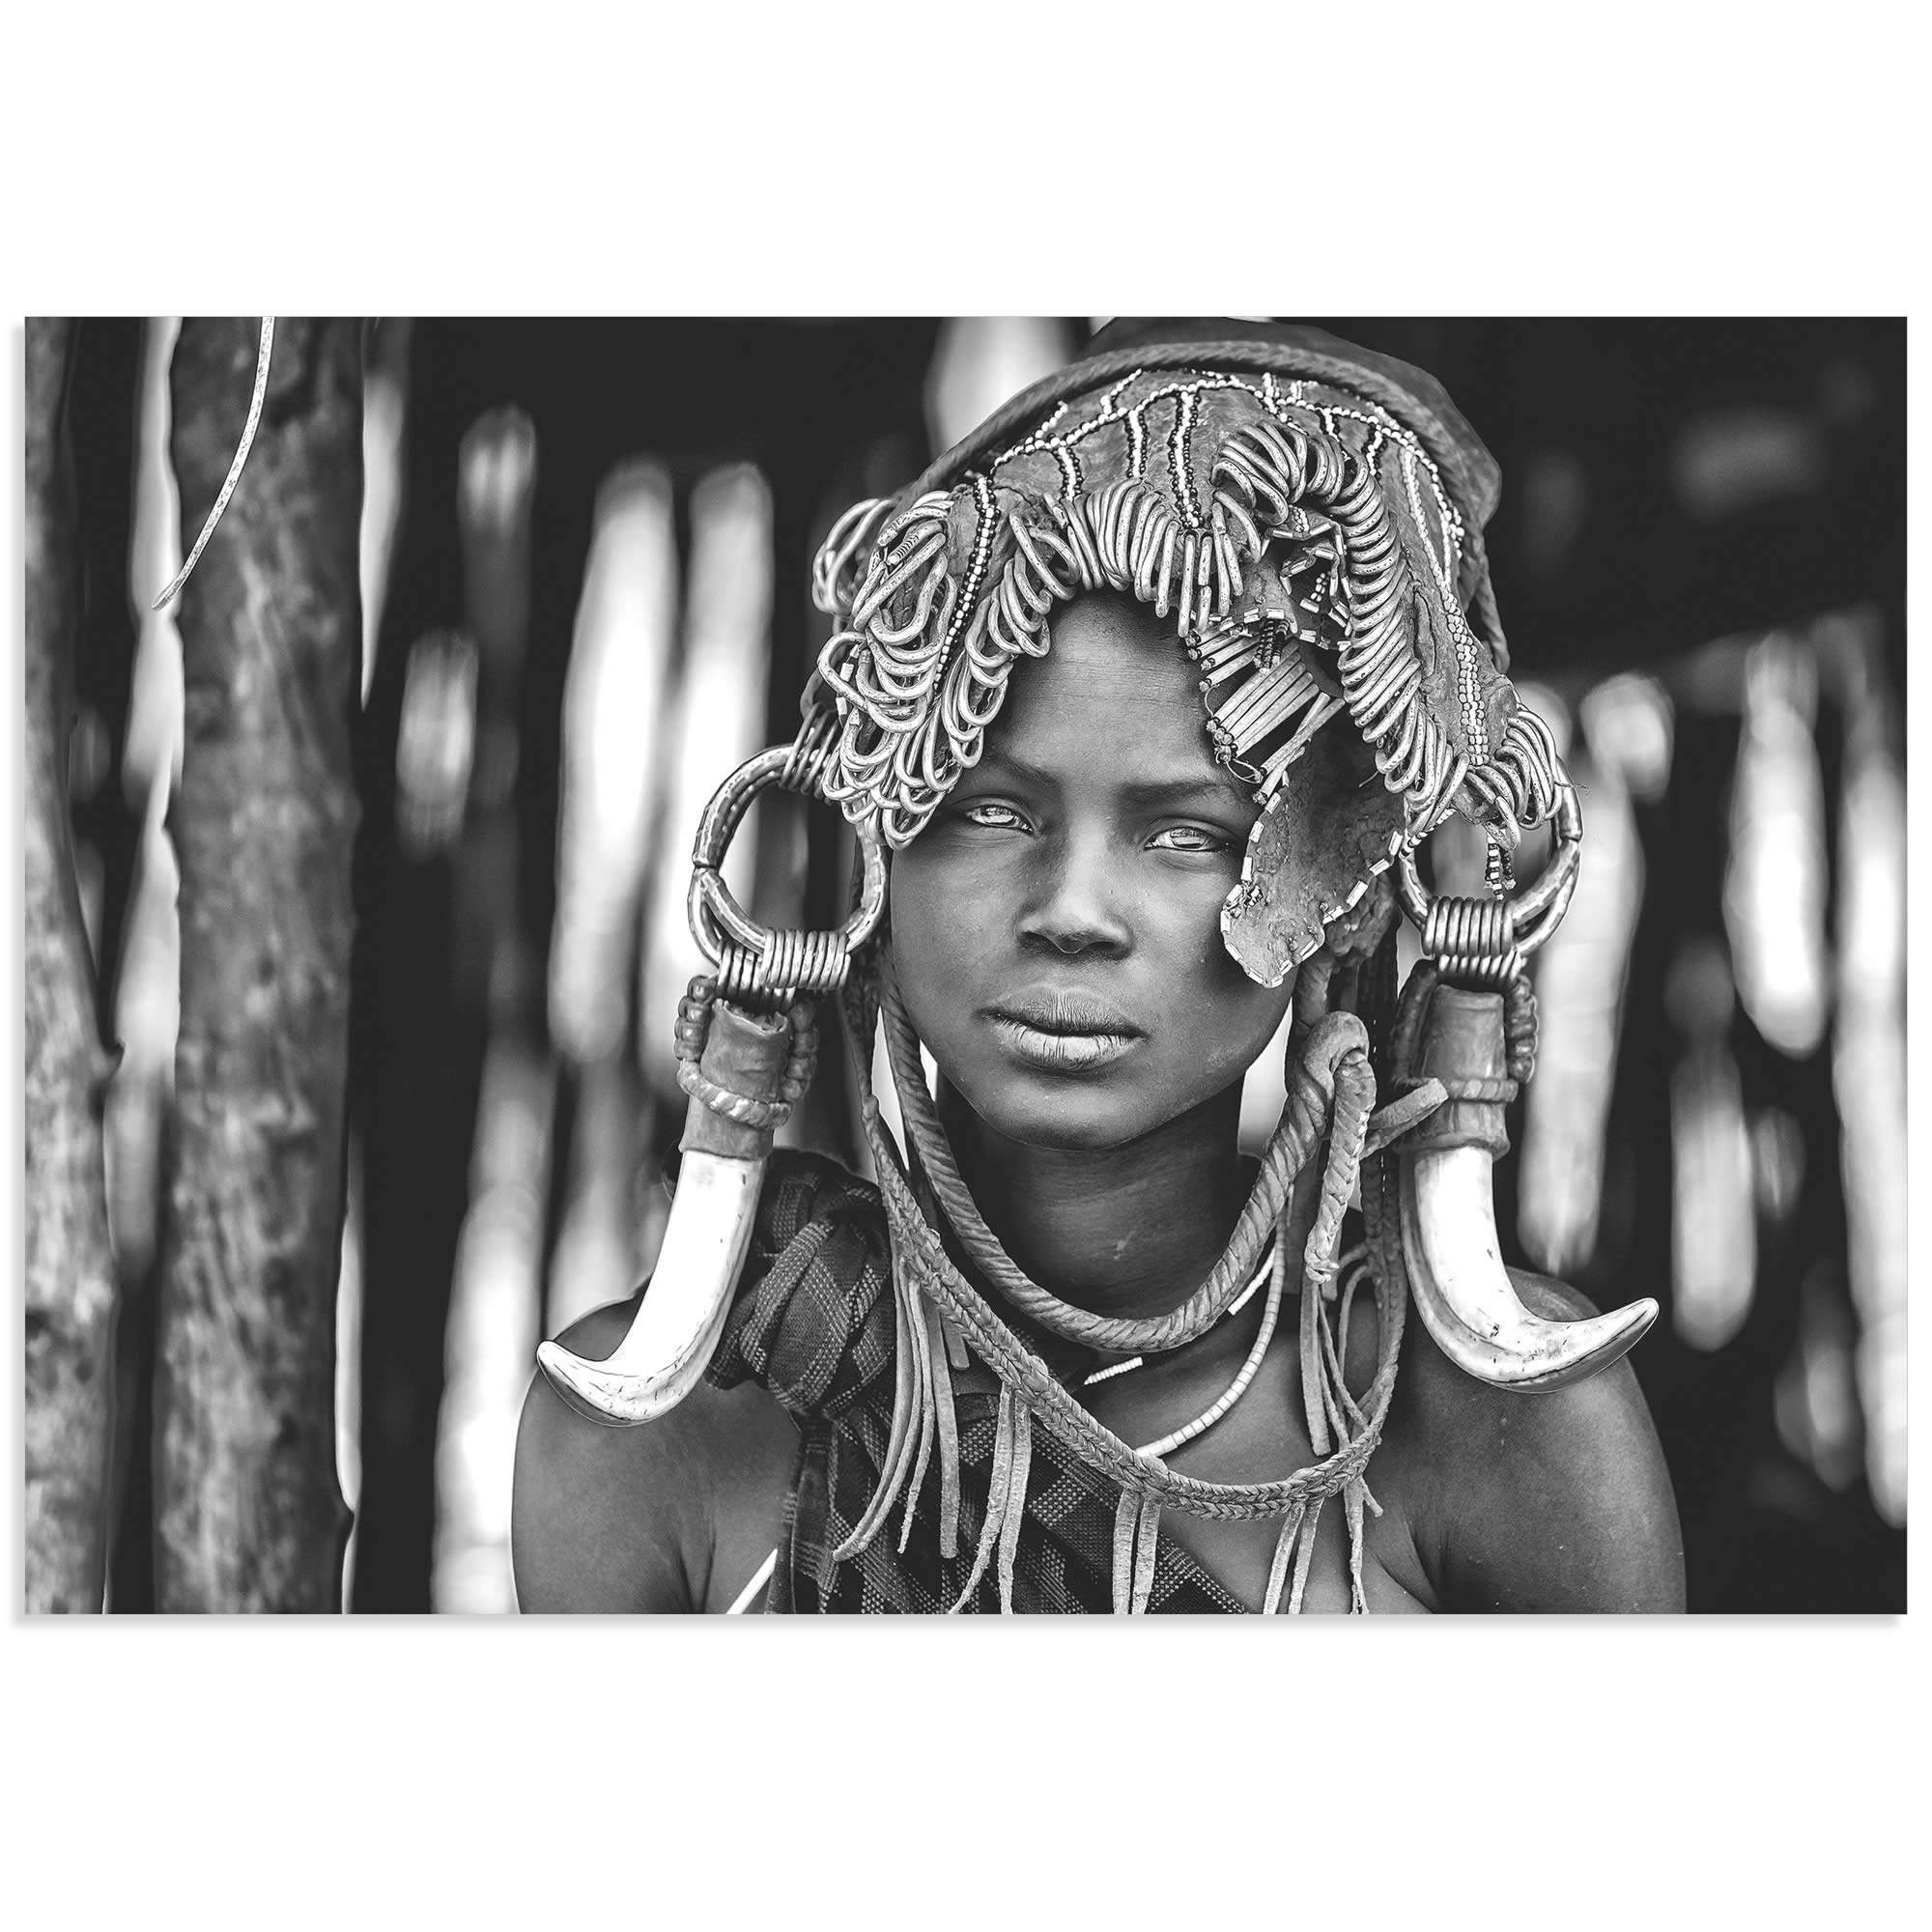 Mursi Headdress by Vedran Vidak - Black & White Indigenous Art on Metal or Acrylic